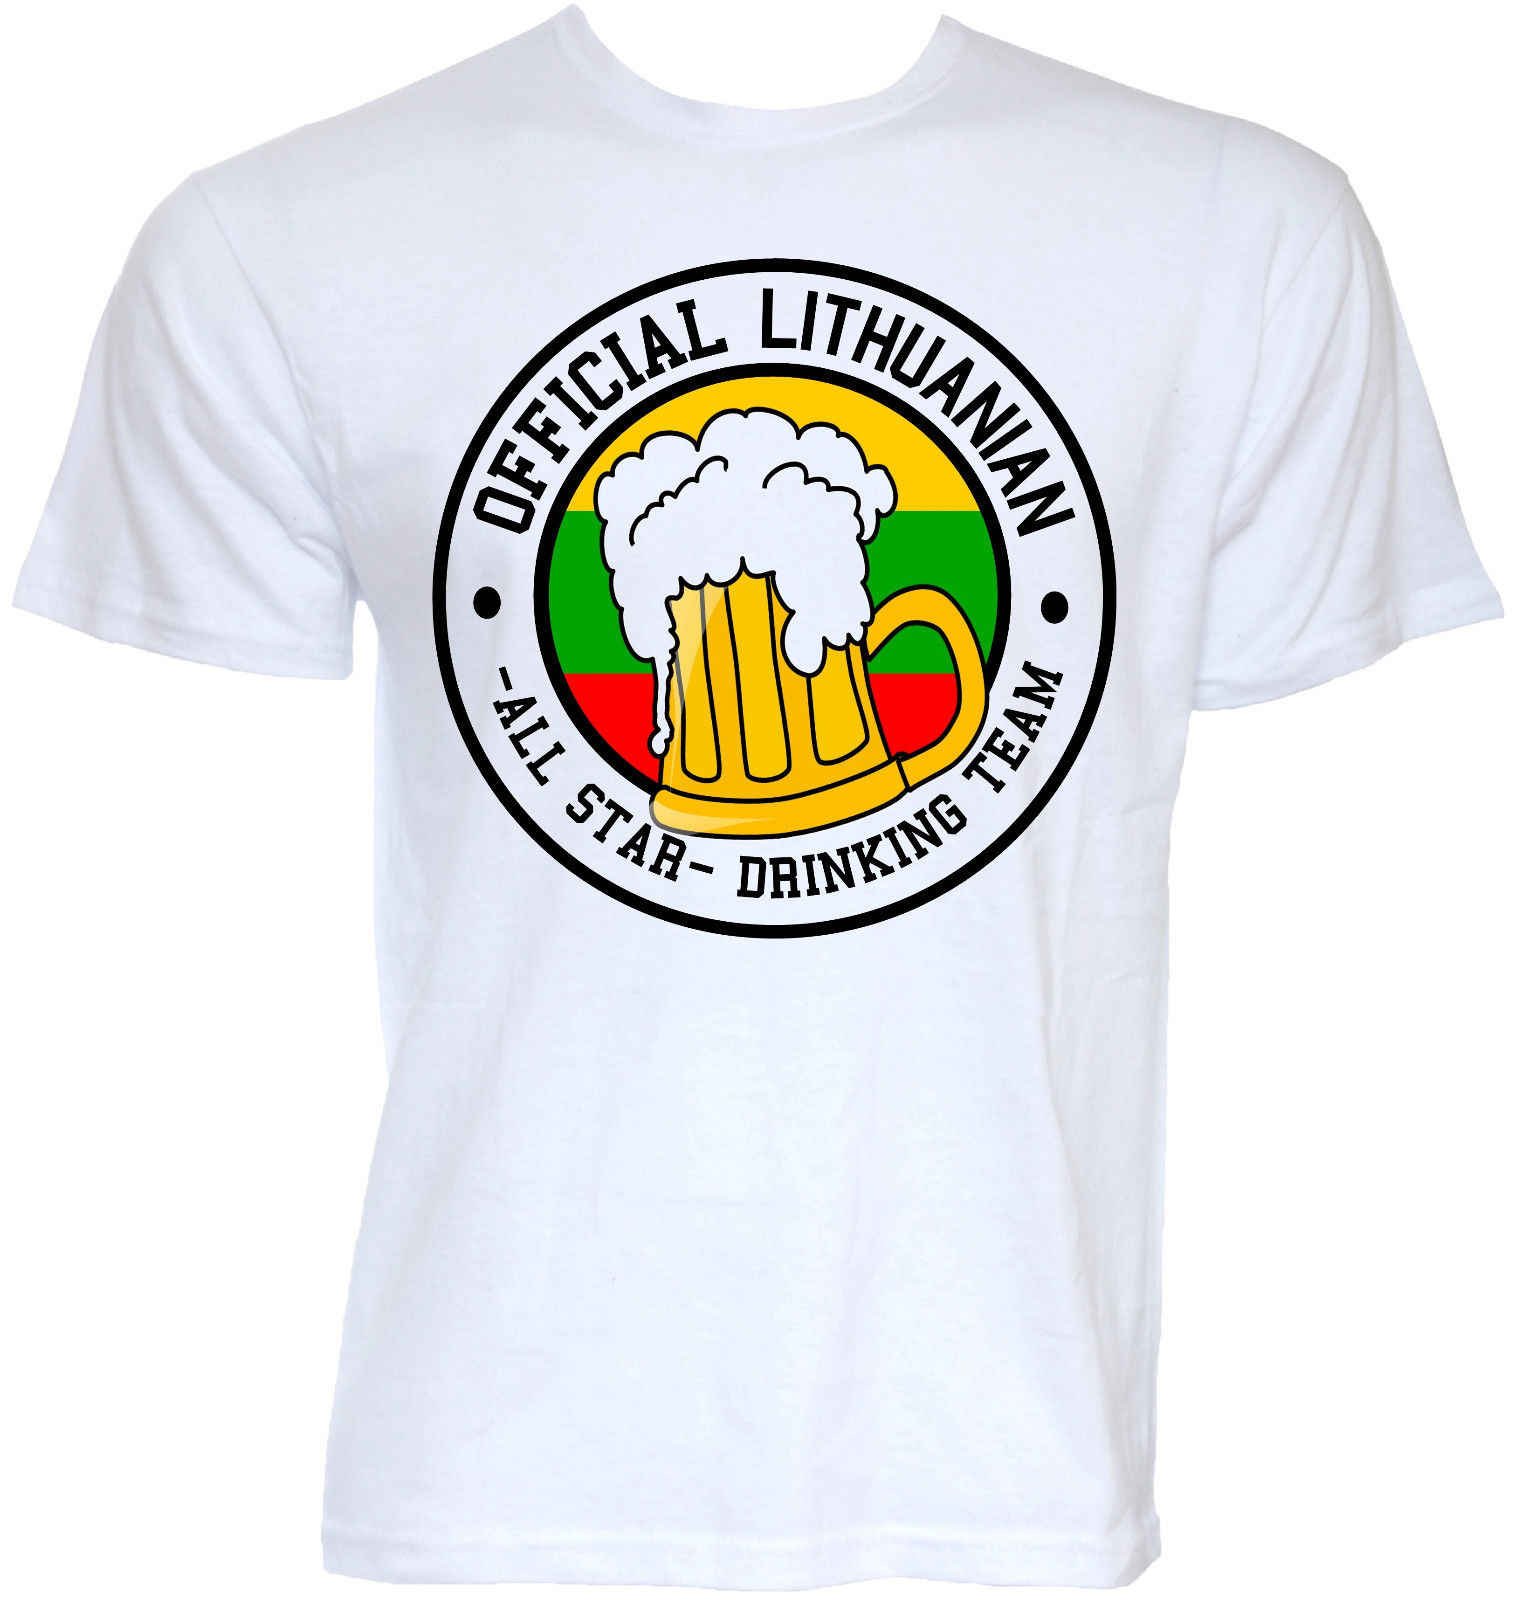 38a6c2d415b74 Для мужчин s Забавный Прохладный Новинка литовский пива команды Литва флаг  шутка футболки подарки футболка Для